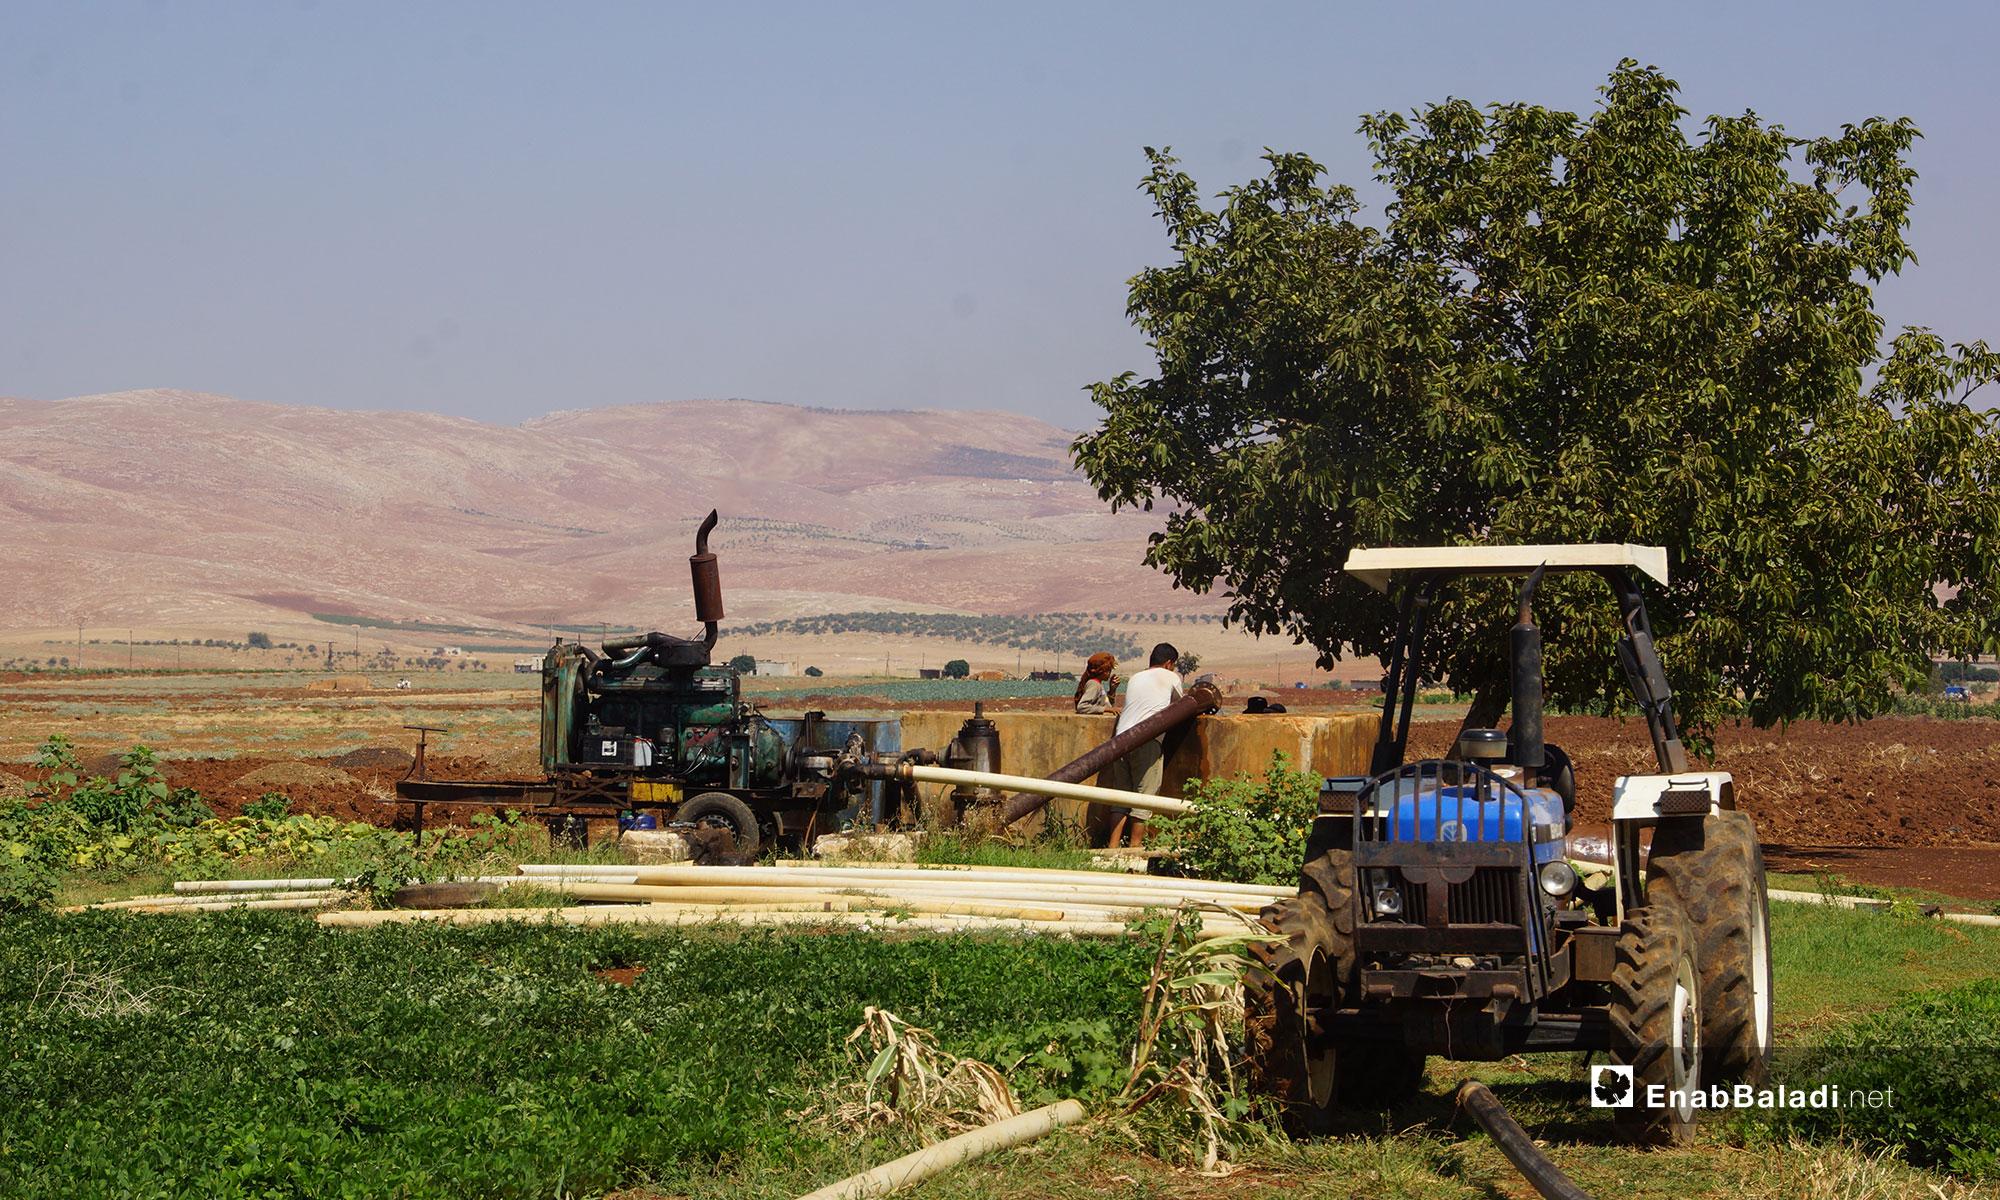 A water pump in a farm in rural Hama – August 29, 2018 (Enab Baladi)